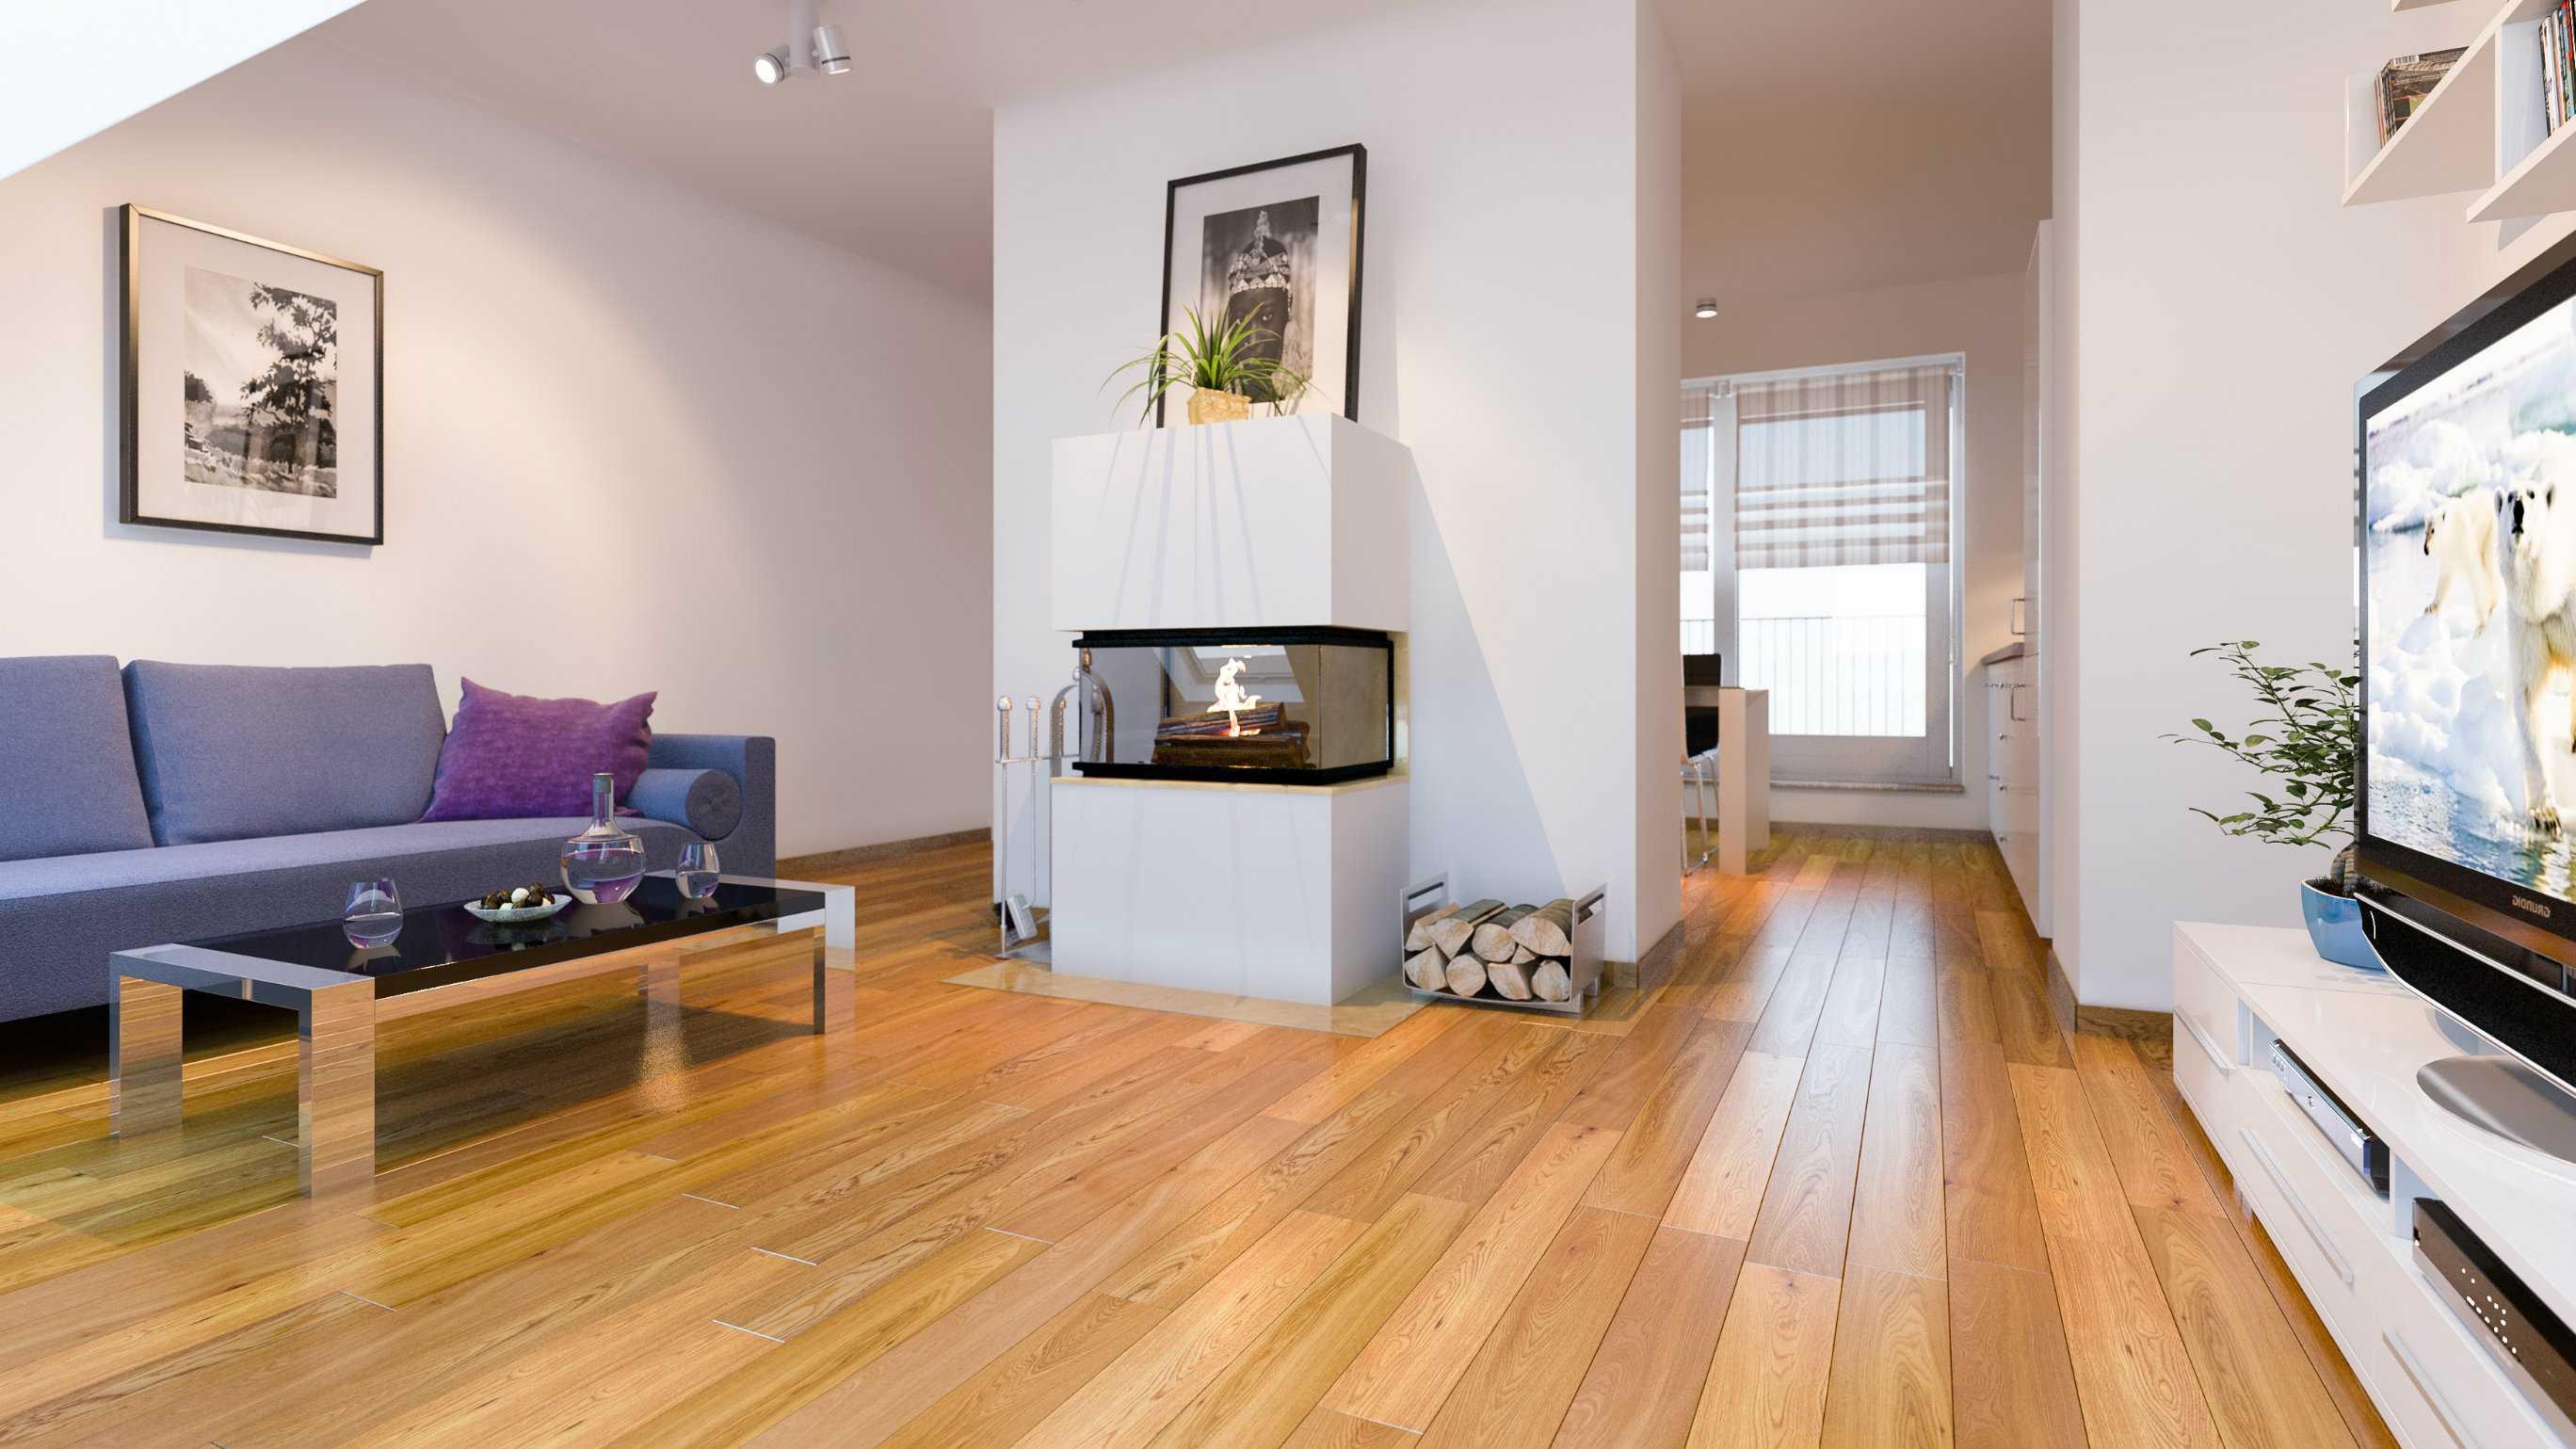 penthouse construction ges m b h reinprechtsdorfer stra e 59 61 1050 wien. Black Bedroom Furniture Sets. Home Design Ideas